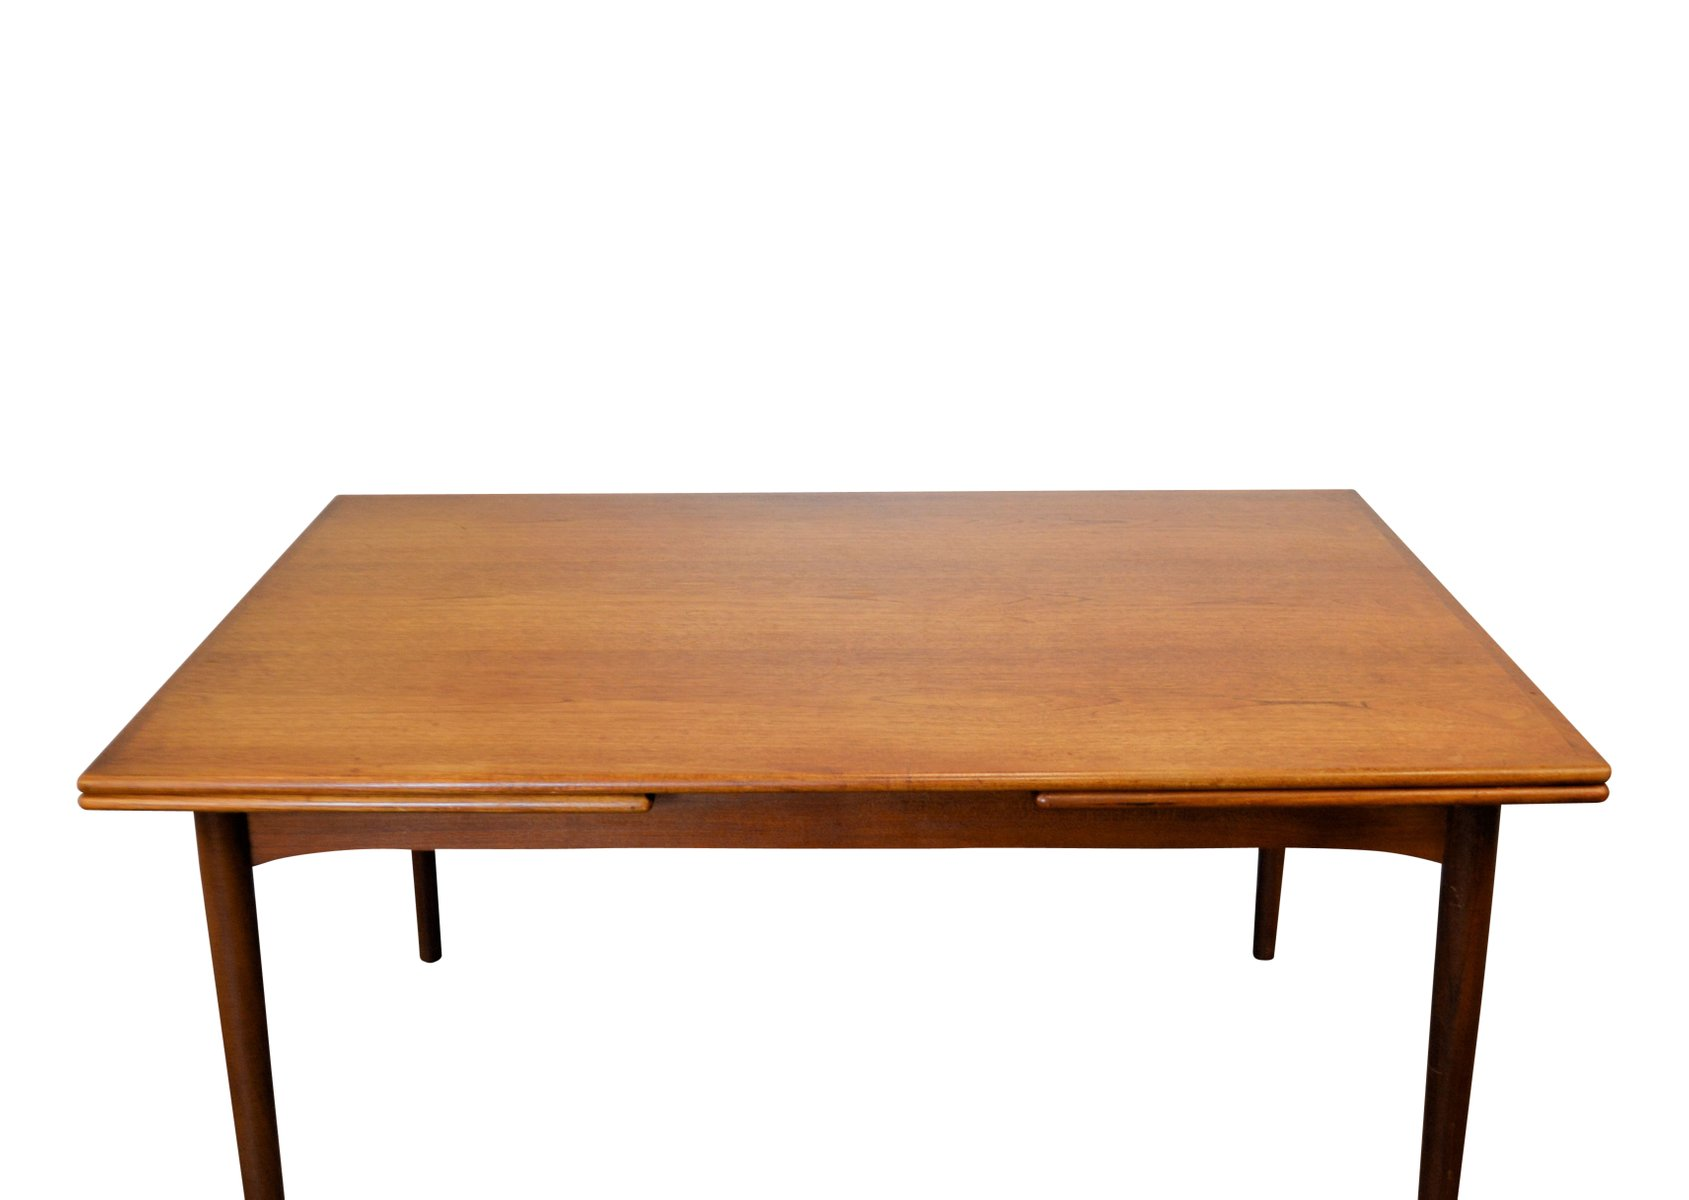 Vintage Danish Extendable Teak Dining Table for sale at Pamono : vintage danish extendable teak dining table 4 from www.pamono.com.au size 1690 x 1200 jpeg 61kB